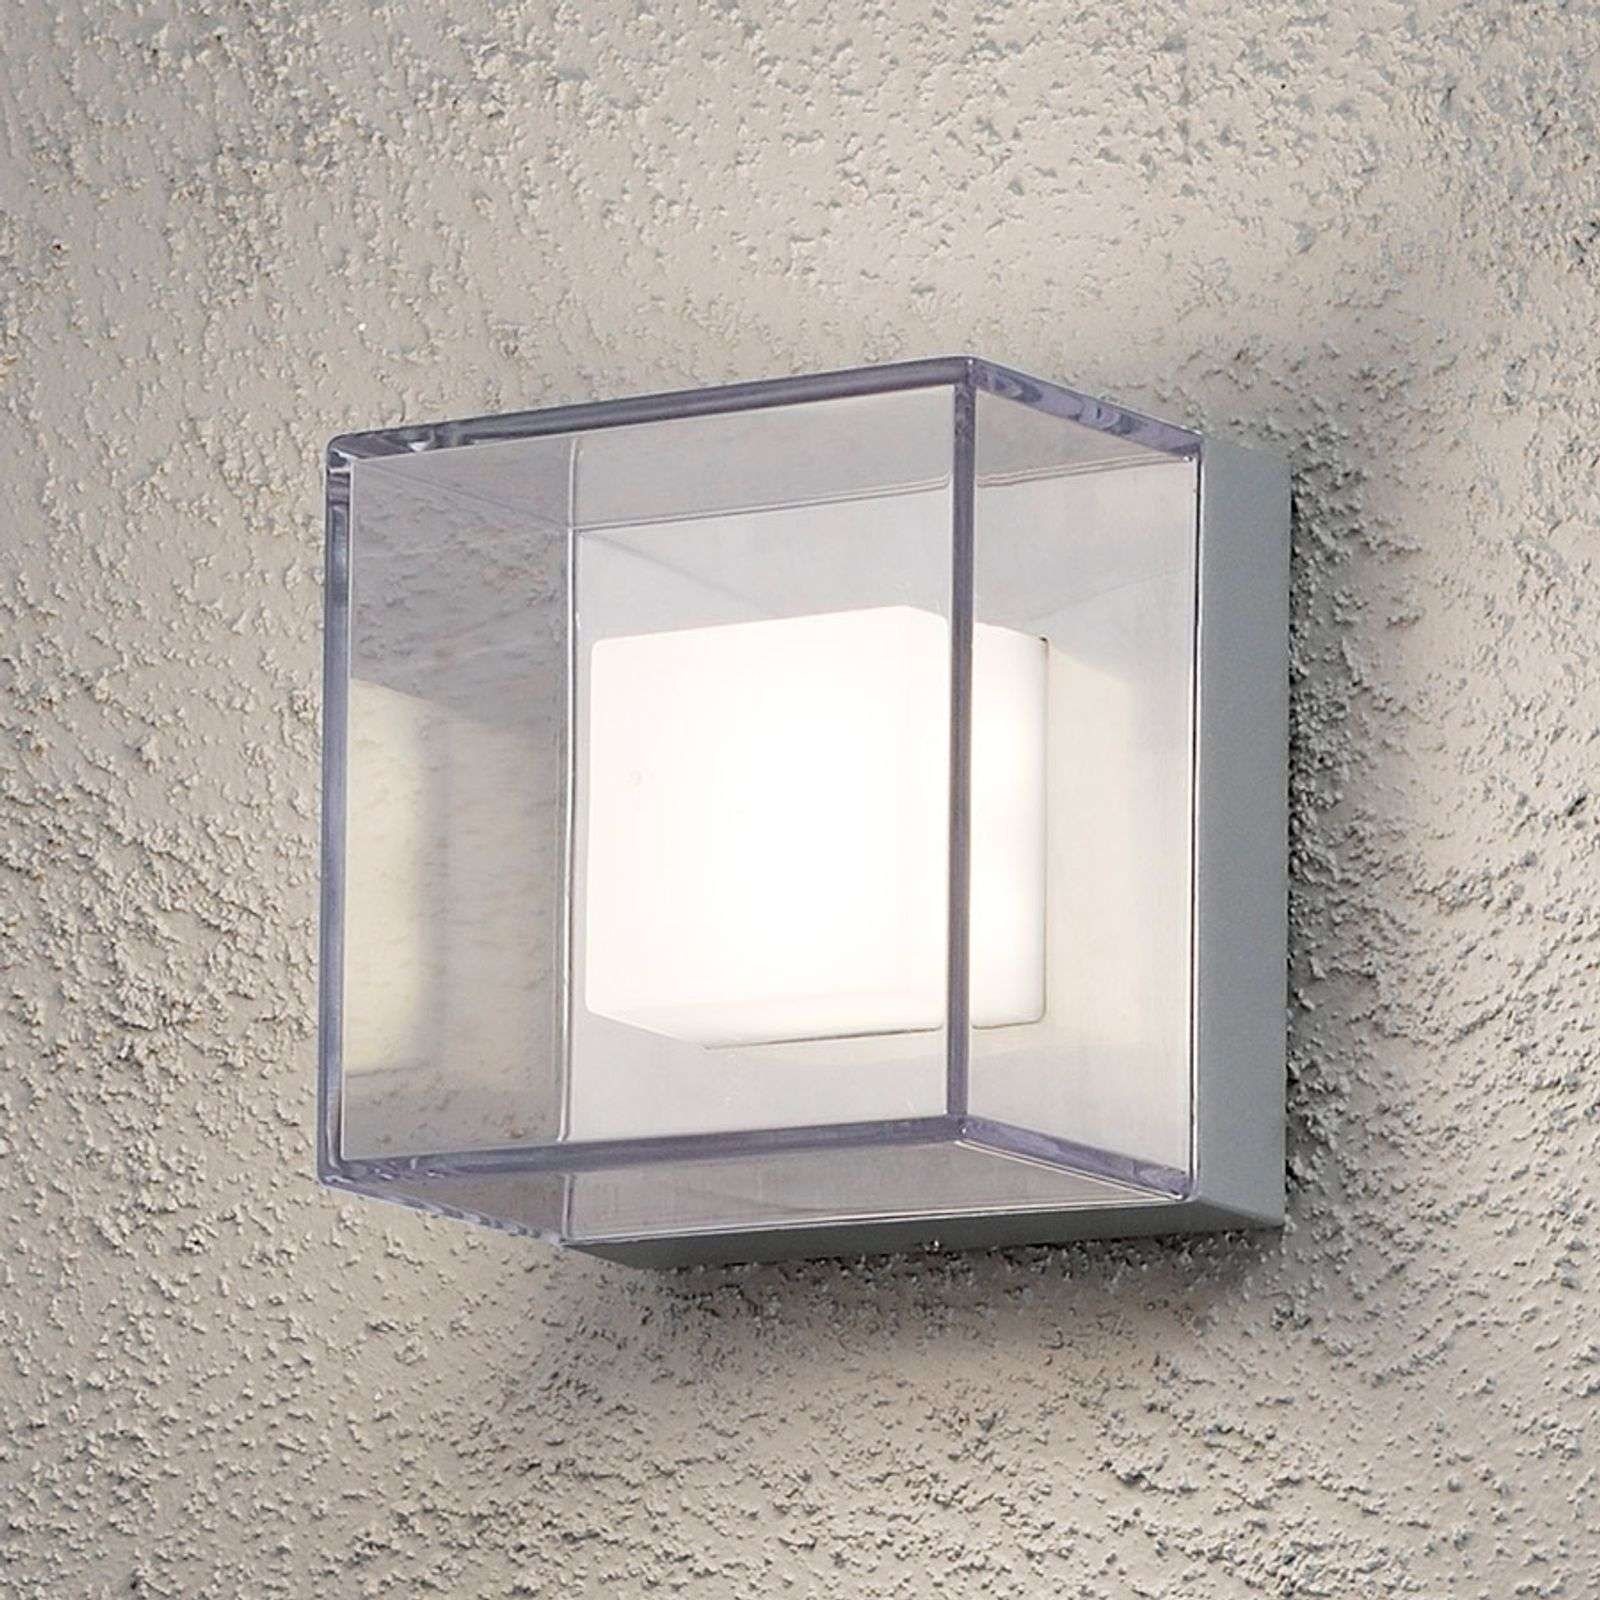 Buitenlamp Sensor Draadloos Rvs Buitenverlichting Led Lichtsensor Lamp Buiten Buitenverlichting Led Bewegingssensor Wandlamp Led Buiten Wandverlichting